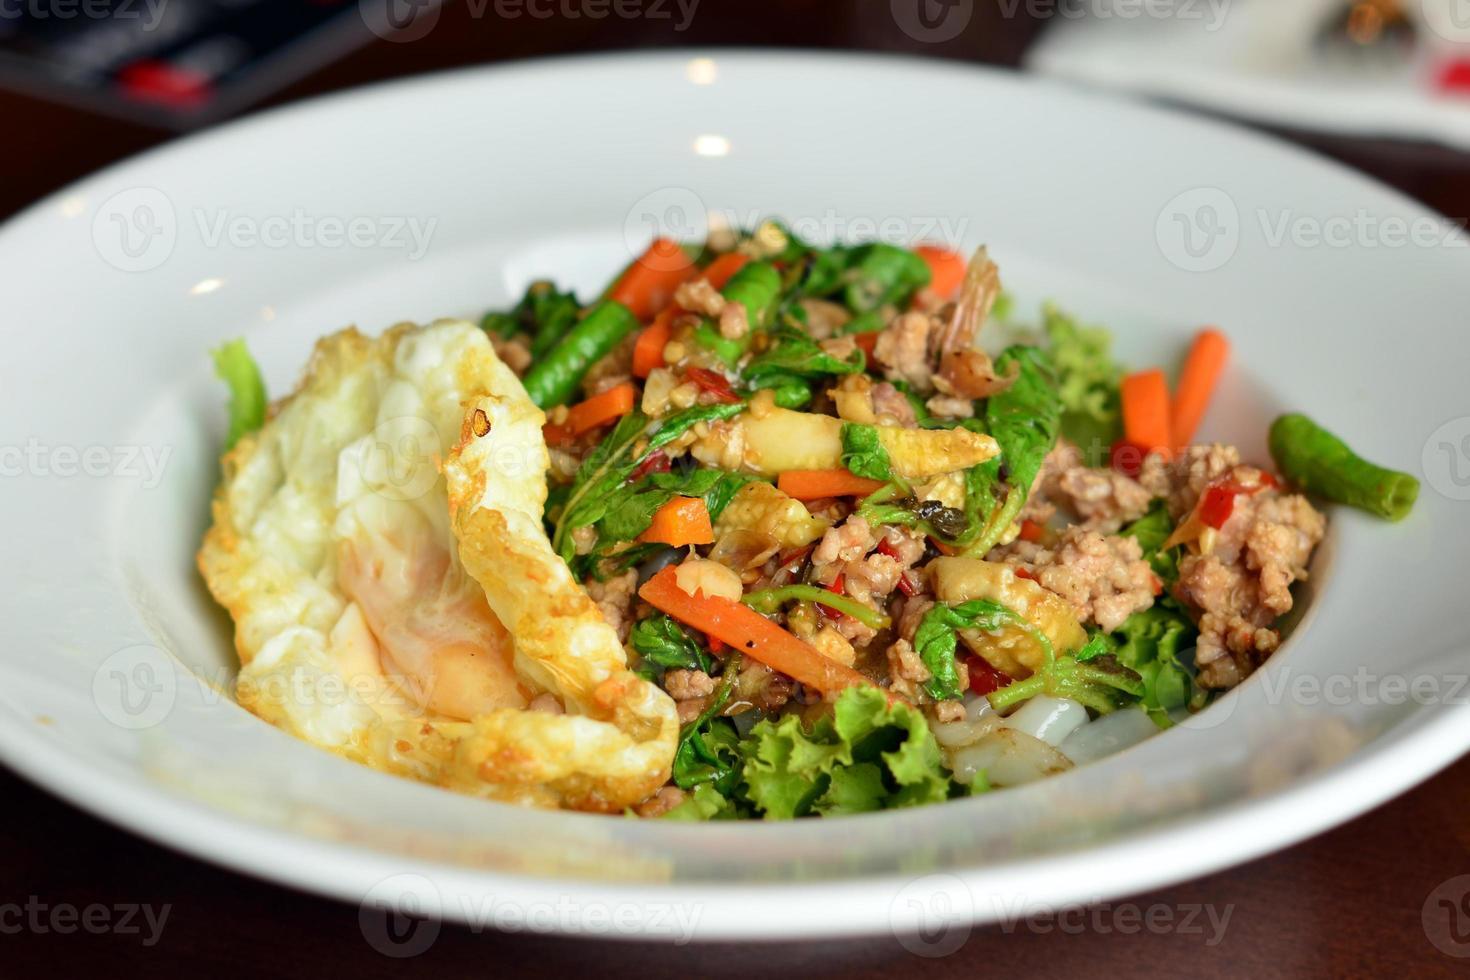 fideos tailandeses revuelva albahaca frita con carne de cerdo picada con huevo frito foto